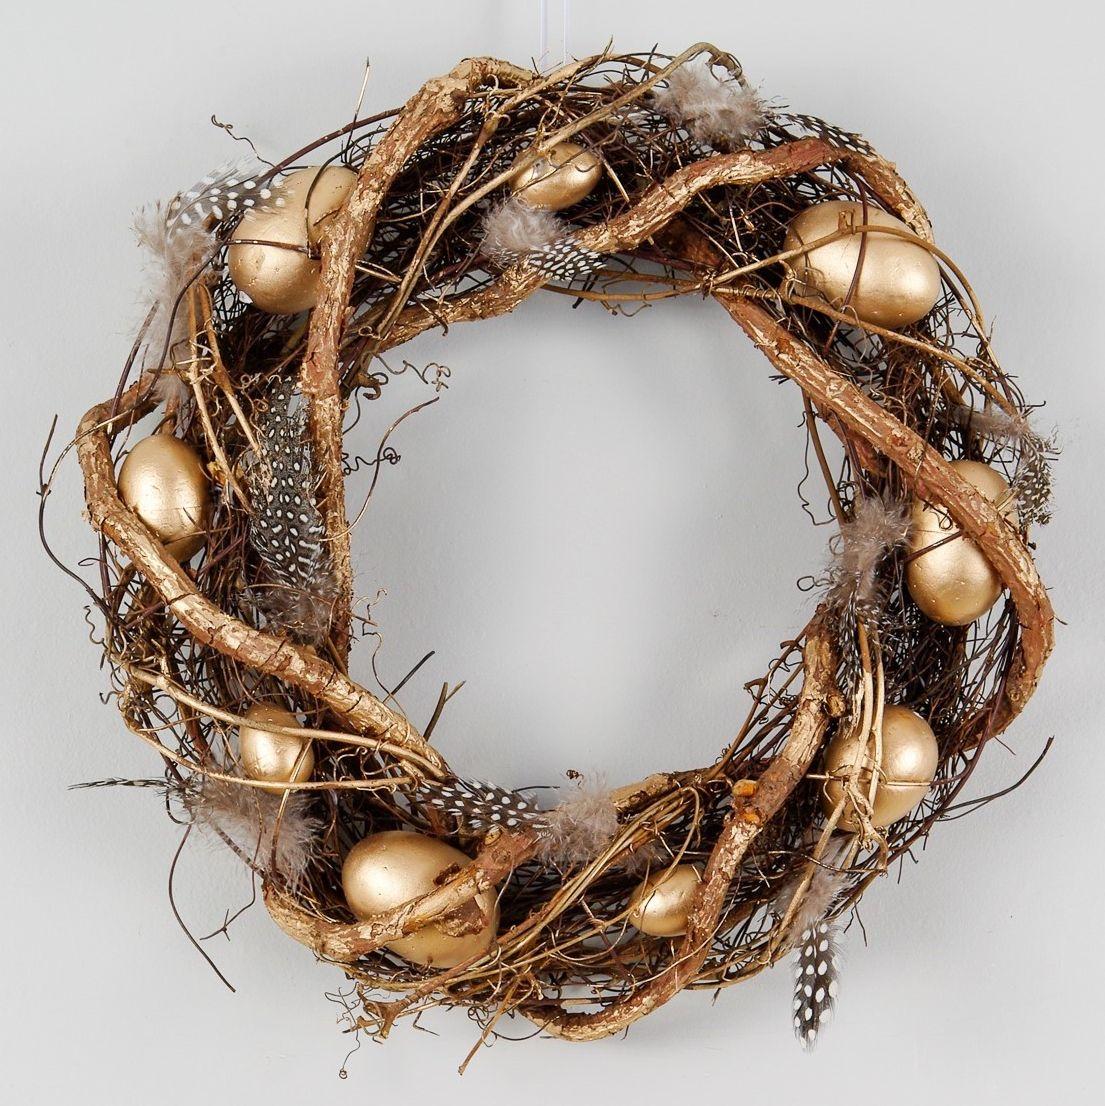 Gold Egg Easter Wreath